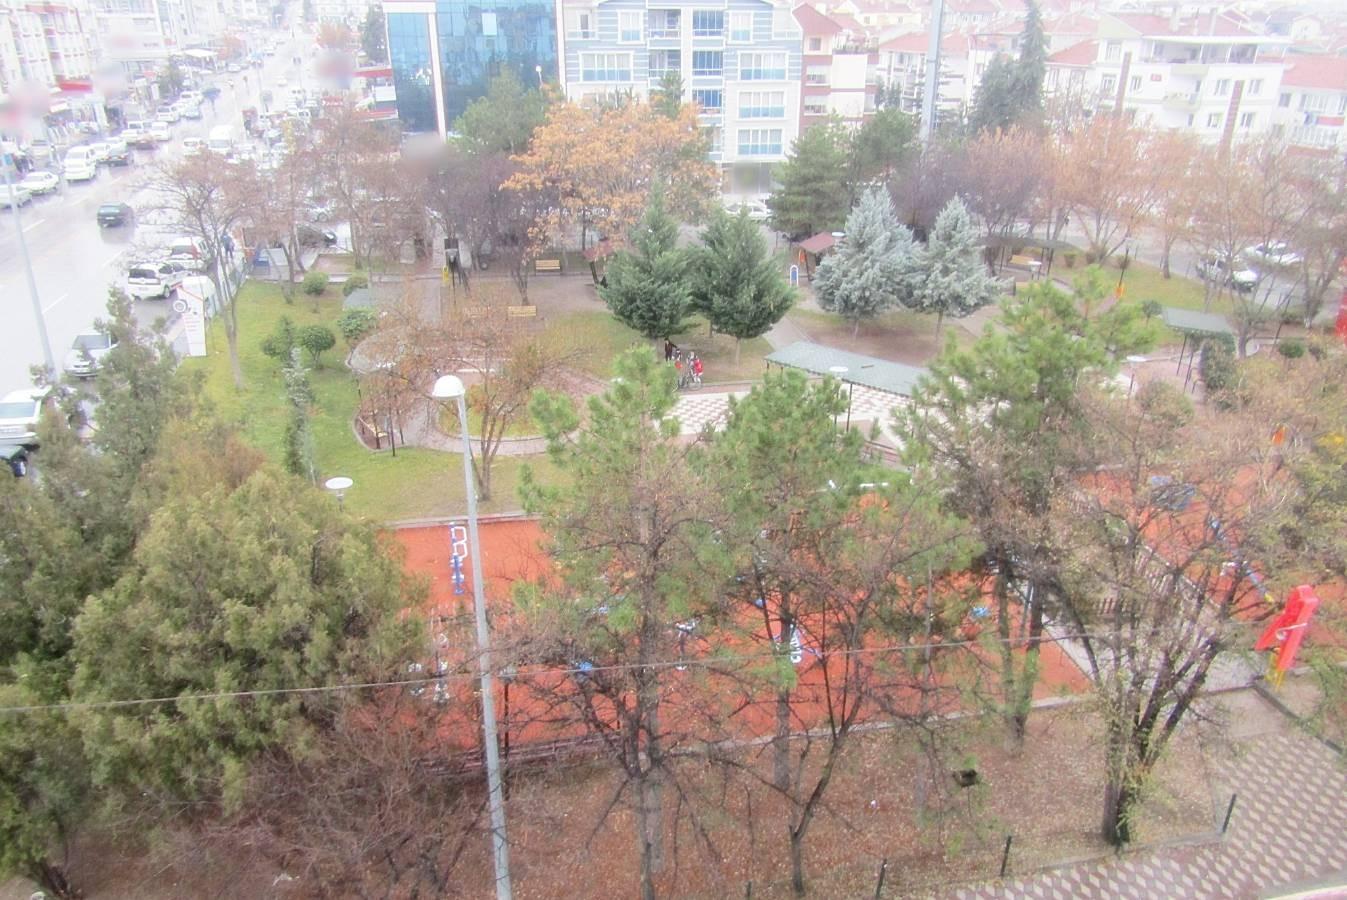 SR EMLAK'TAN SÜVARİ MAH'DE 5+2 230m² YAPILI AÇIK TERAS DAİRE